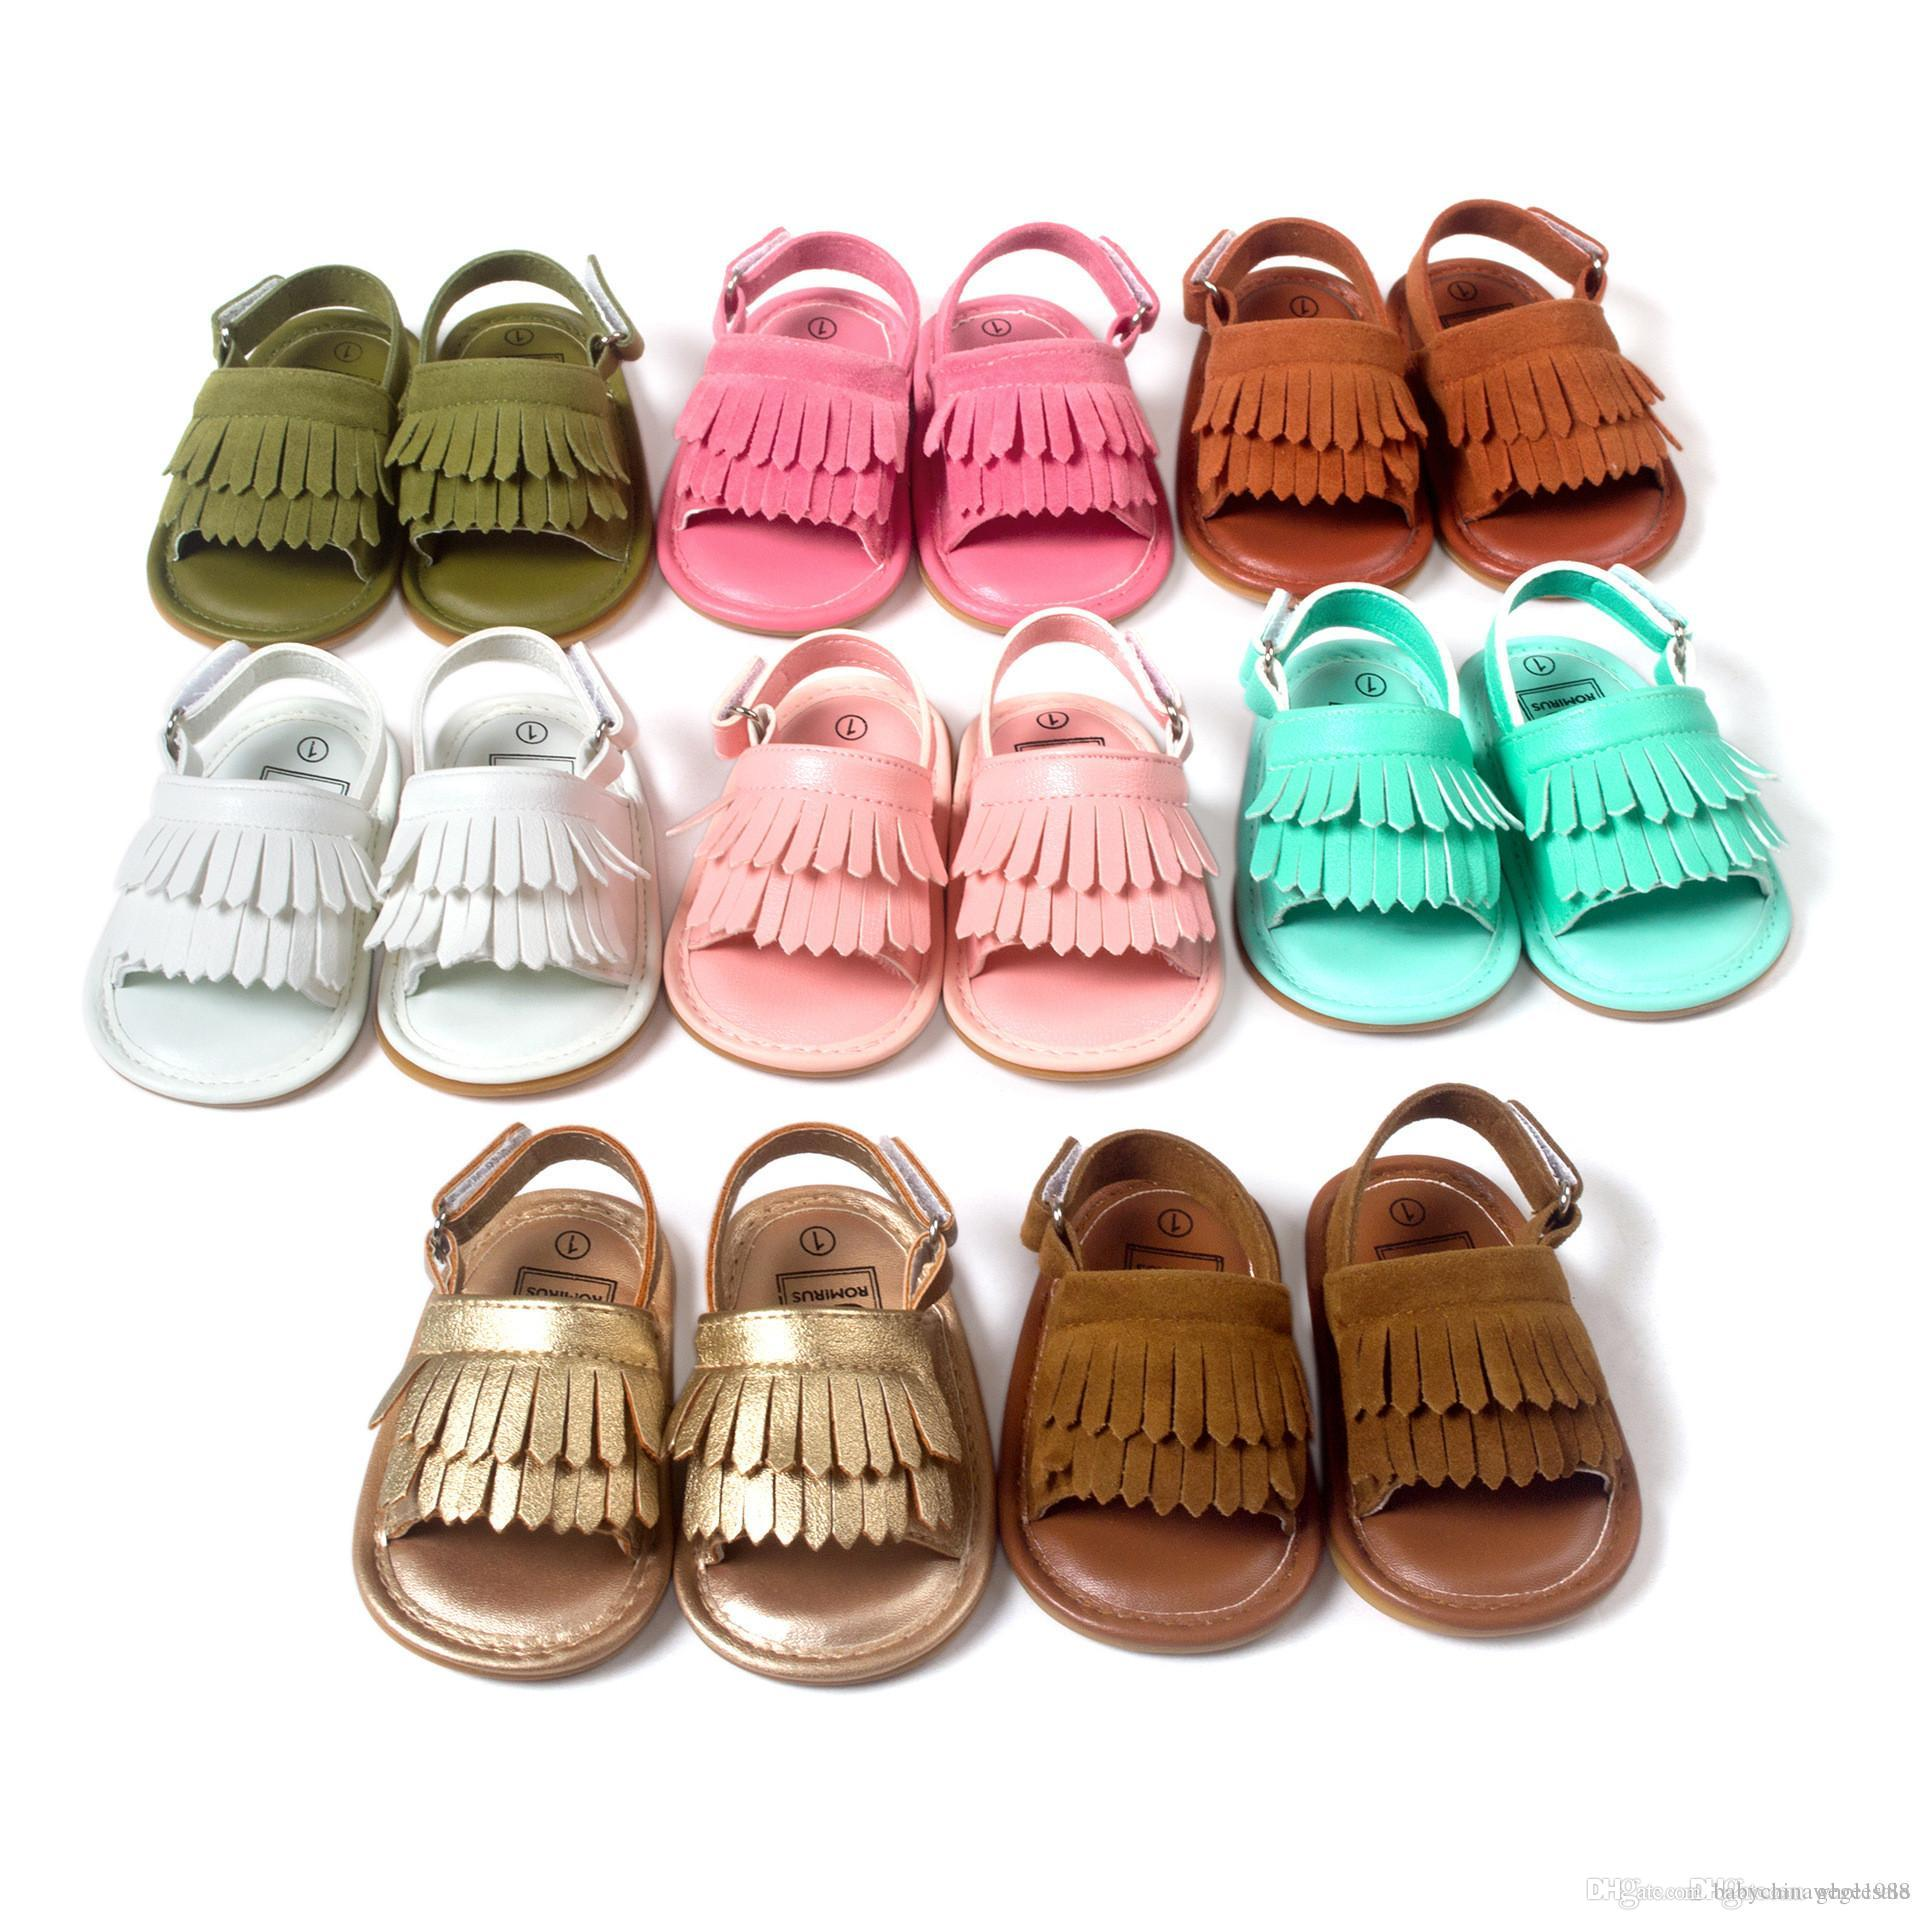 877db1fe698e 2016 Summer Kids Moccs New Fashion Baby Kids Shoes Sandal Sho Girls Boys  Shoes Children Sandals BX164 Childrens Brown Sandals Buy Boys Shoes From ...